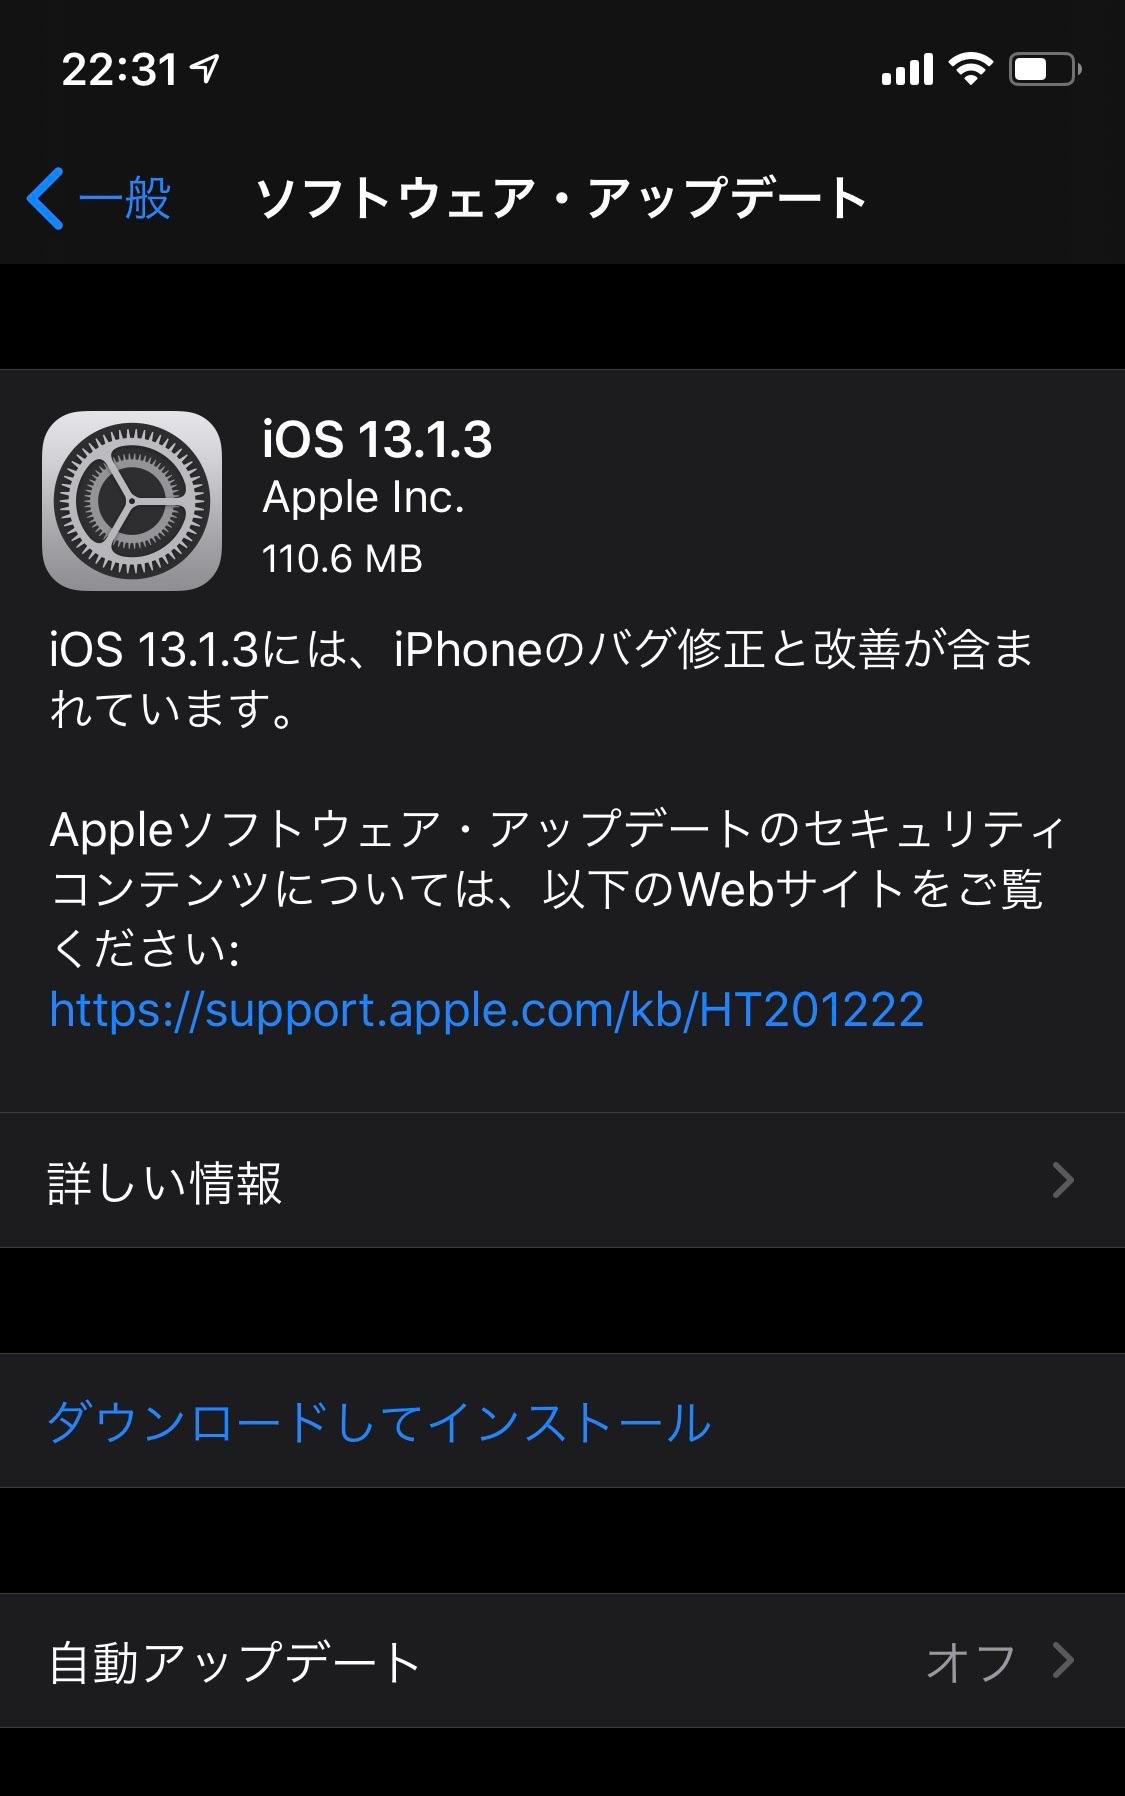 iOS/iPadOS 13.1.3